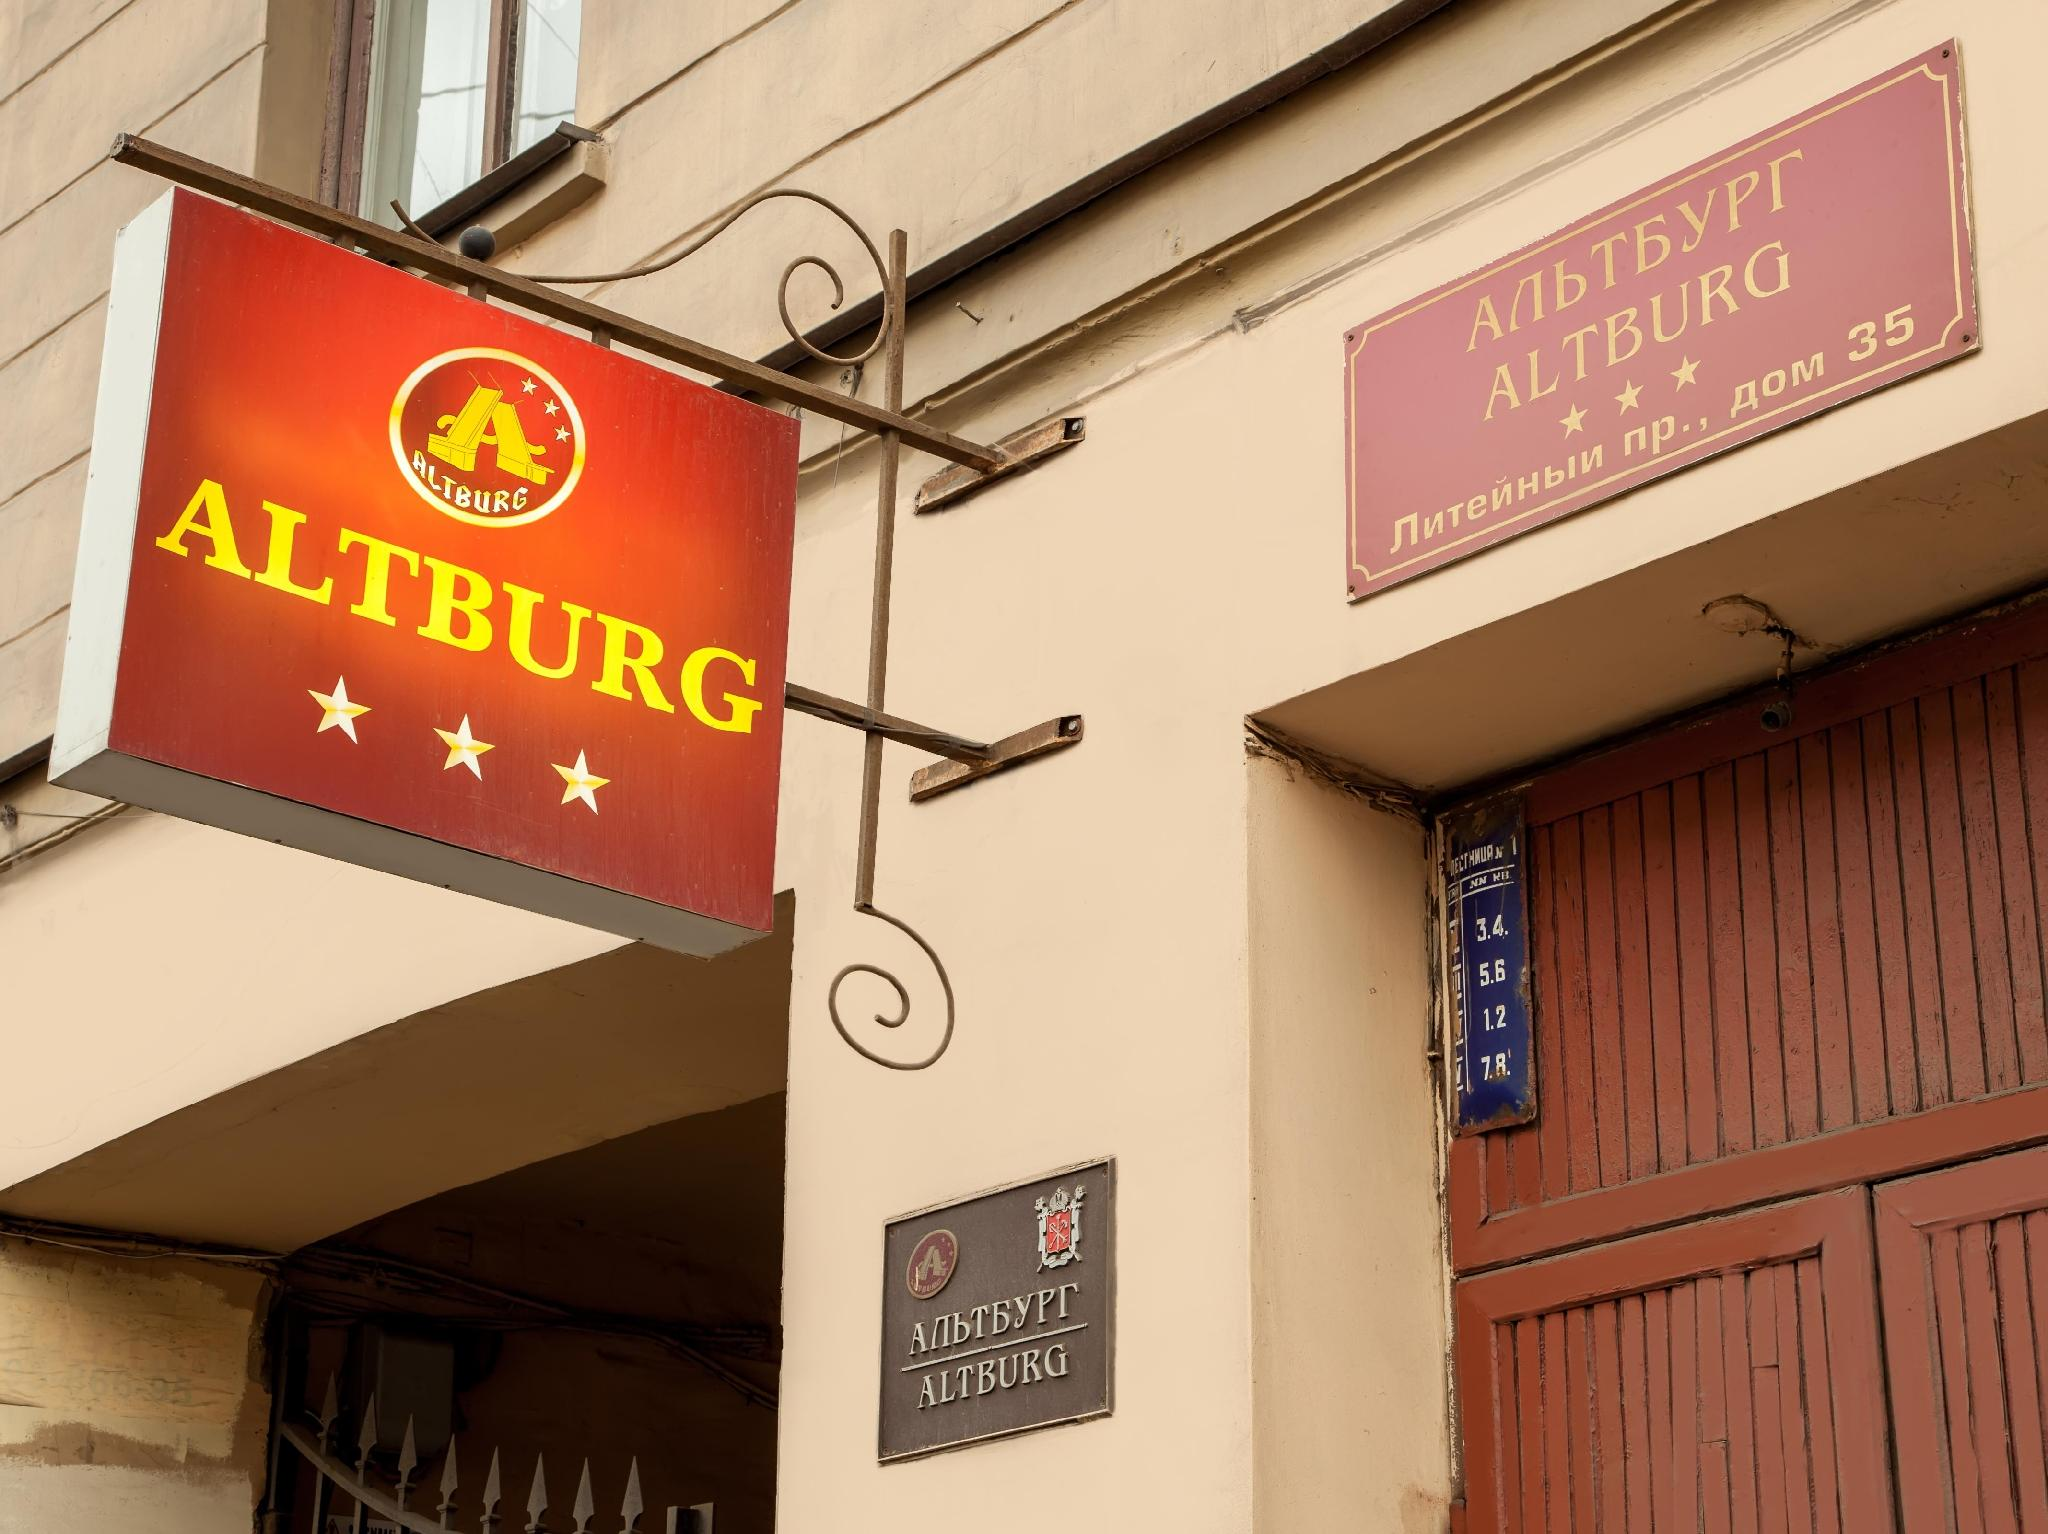 Altburg Hotel